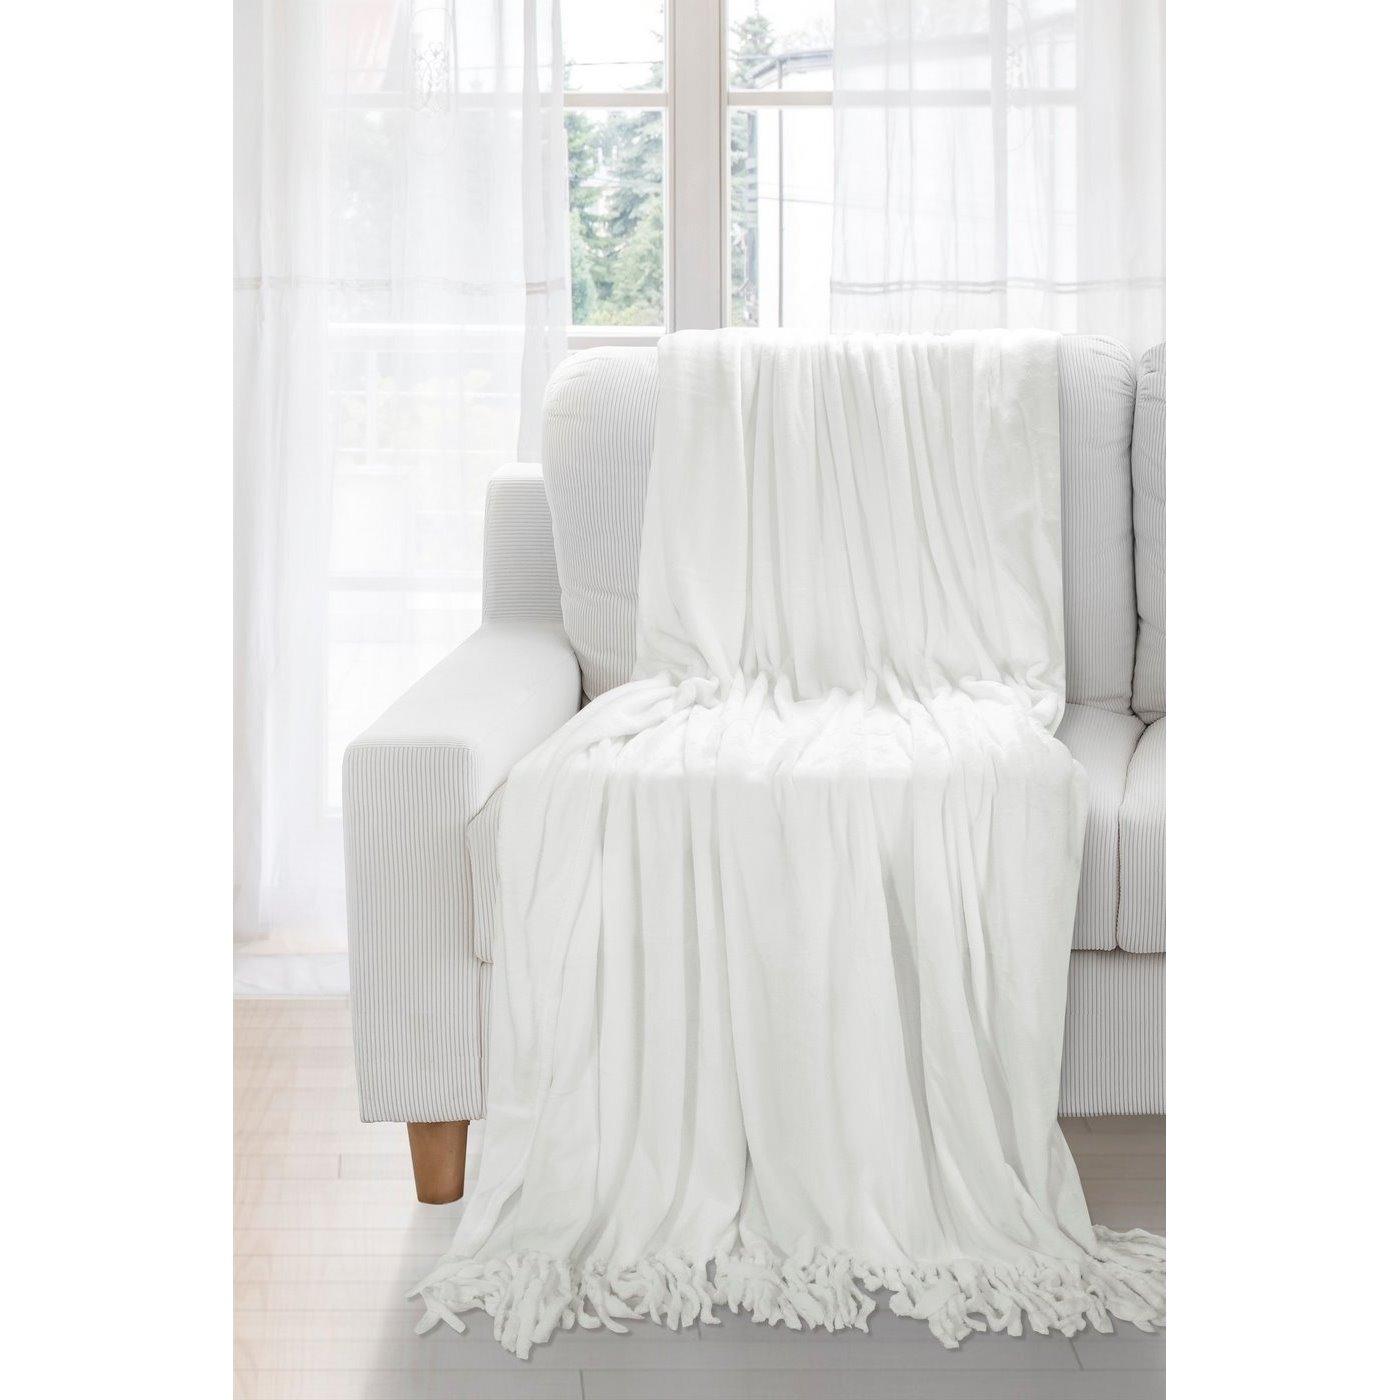 Patura Mona White 150 x 200 cm